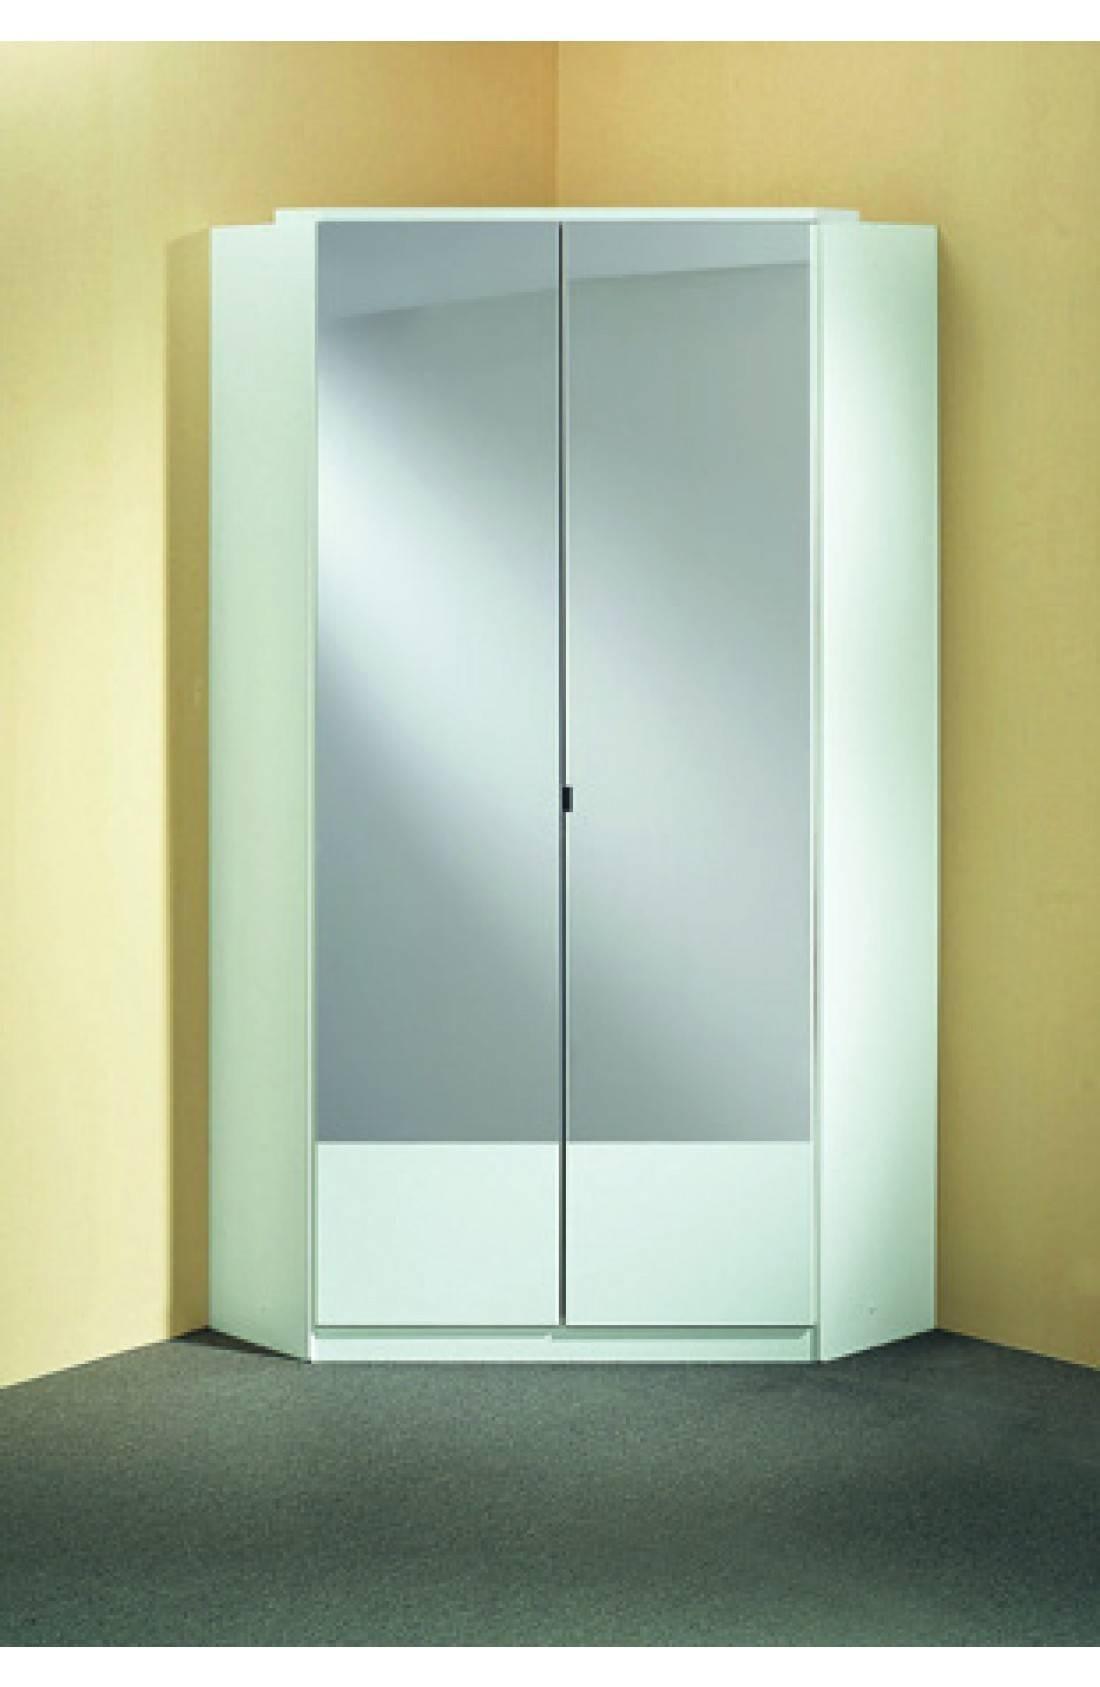 Slumberhaus 'imago' German Made Modern Alpine White & Mirror 2 Inside Corner Mirrored Wardrobes (View 2 of 15)